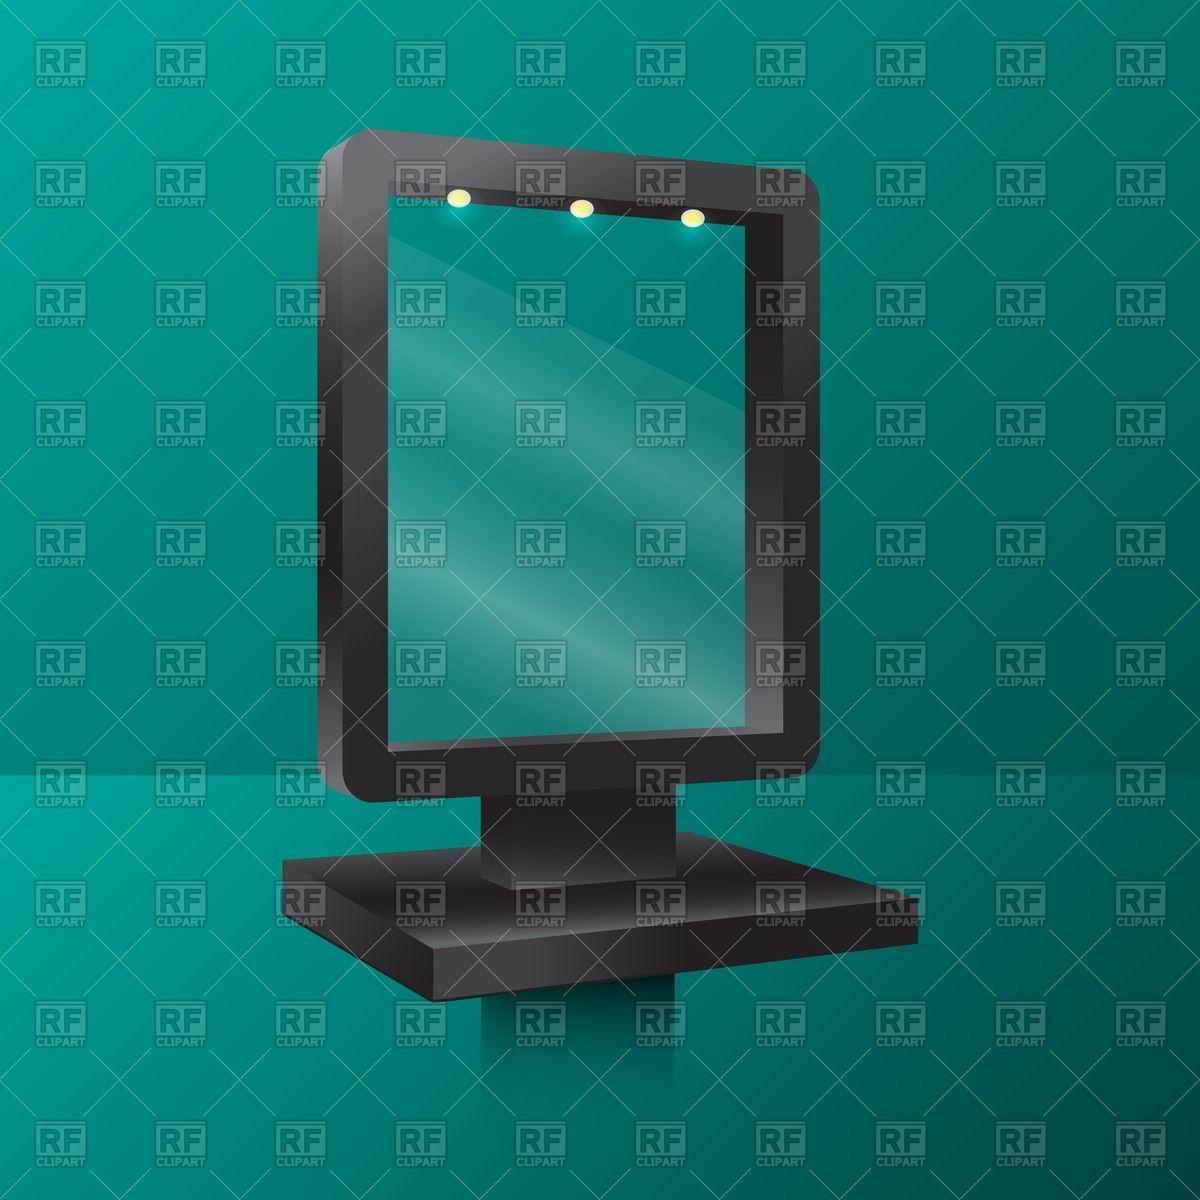 Backlit advertising light box Vector Image #43318.